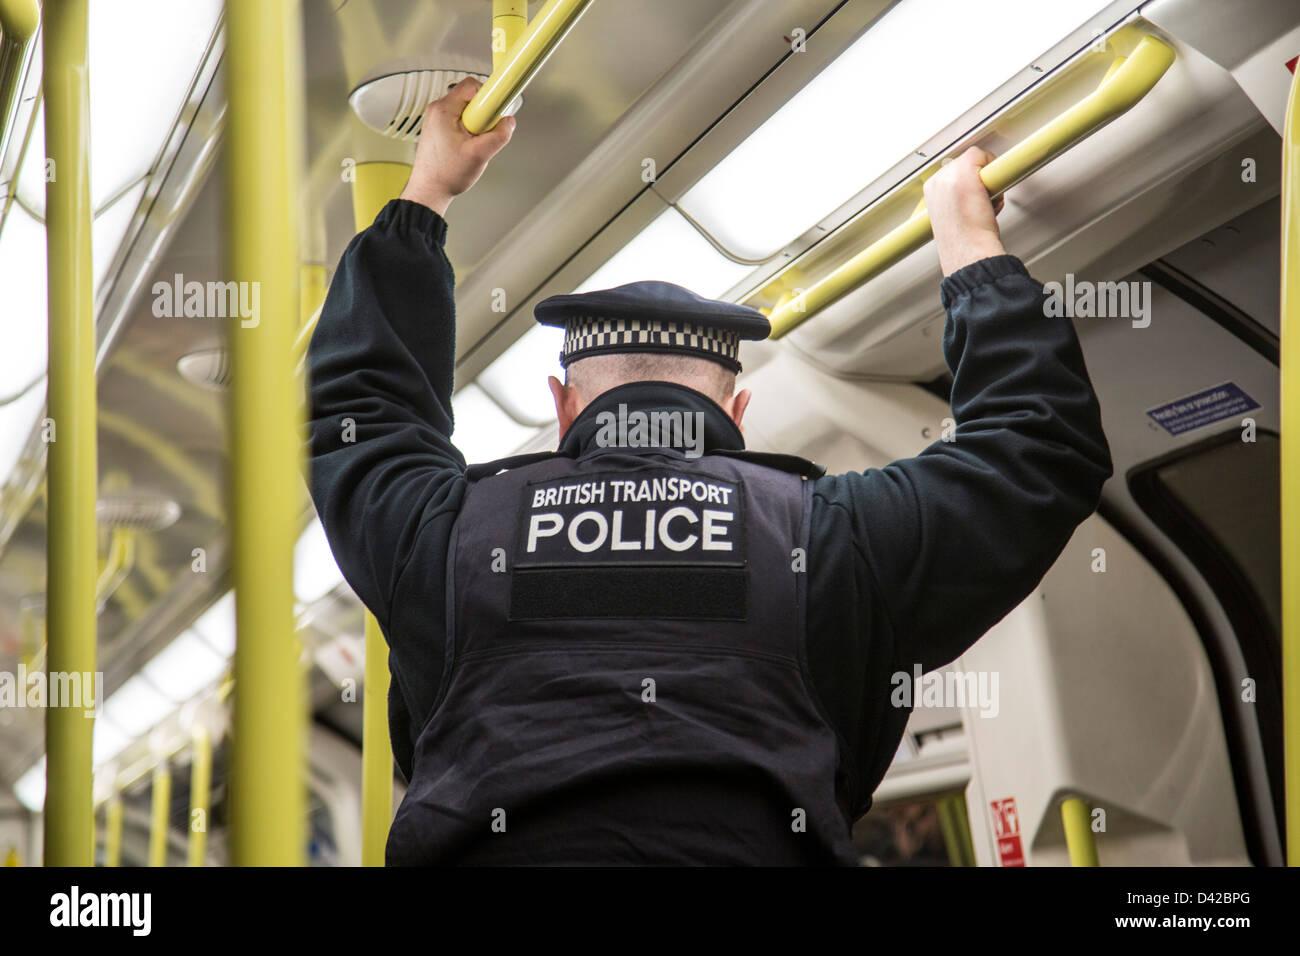 British transport police officer on tube train underground - Stock Image